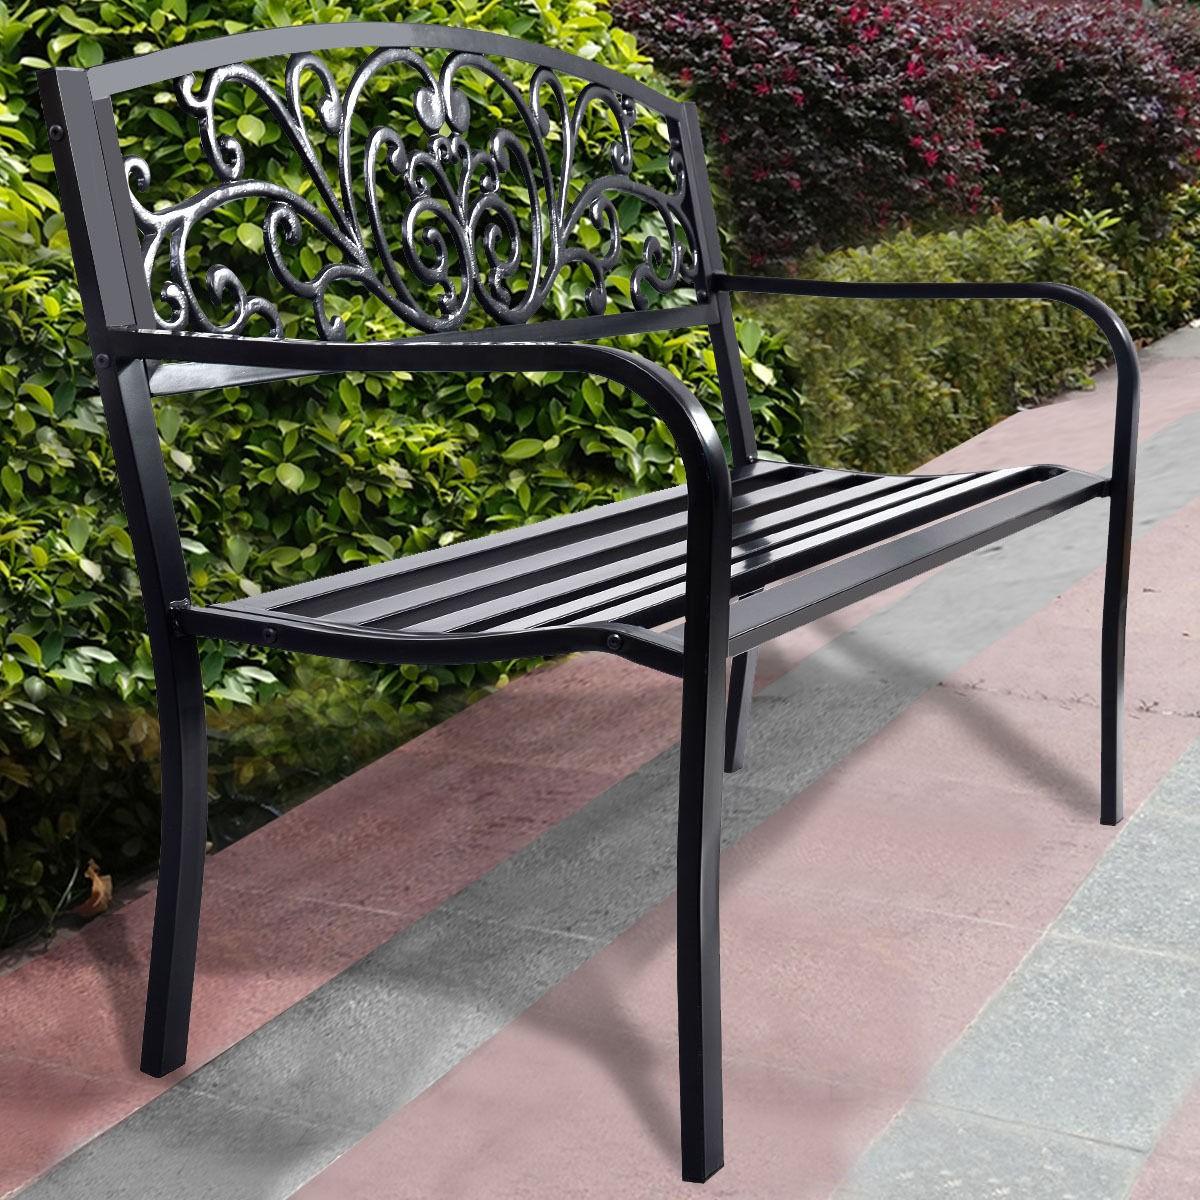 Picture of: 50 Black Patio Park Garden Steel Frame Bench Mesh Style Cast Iron Backrest Outdoor Backyard Furniture Op2786 Aliexpress